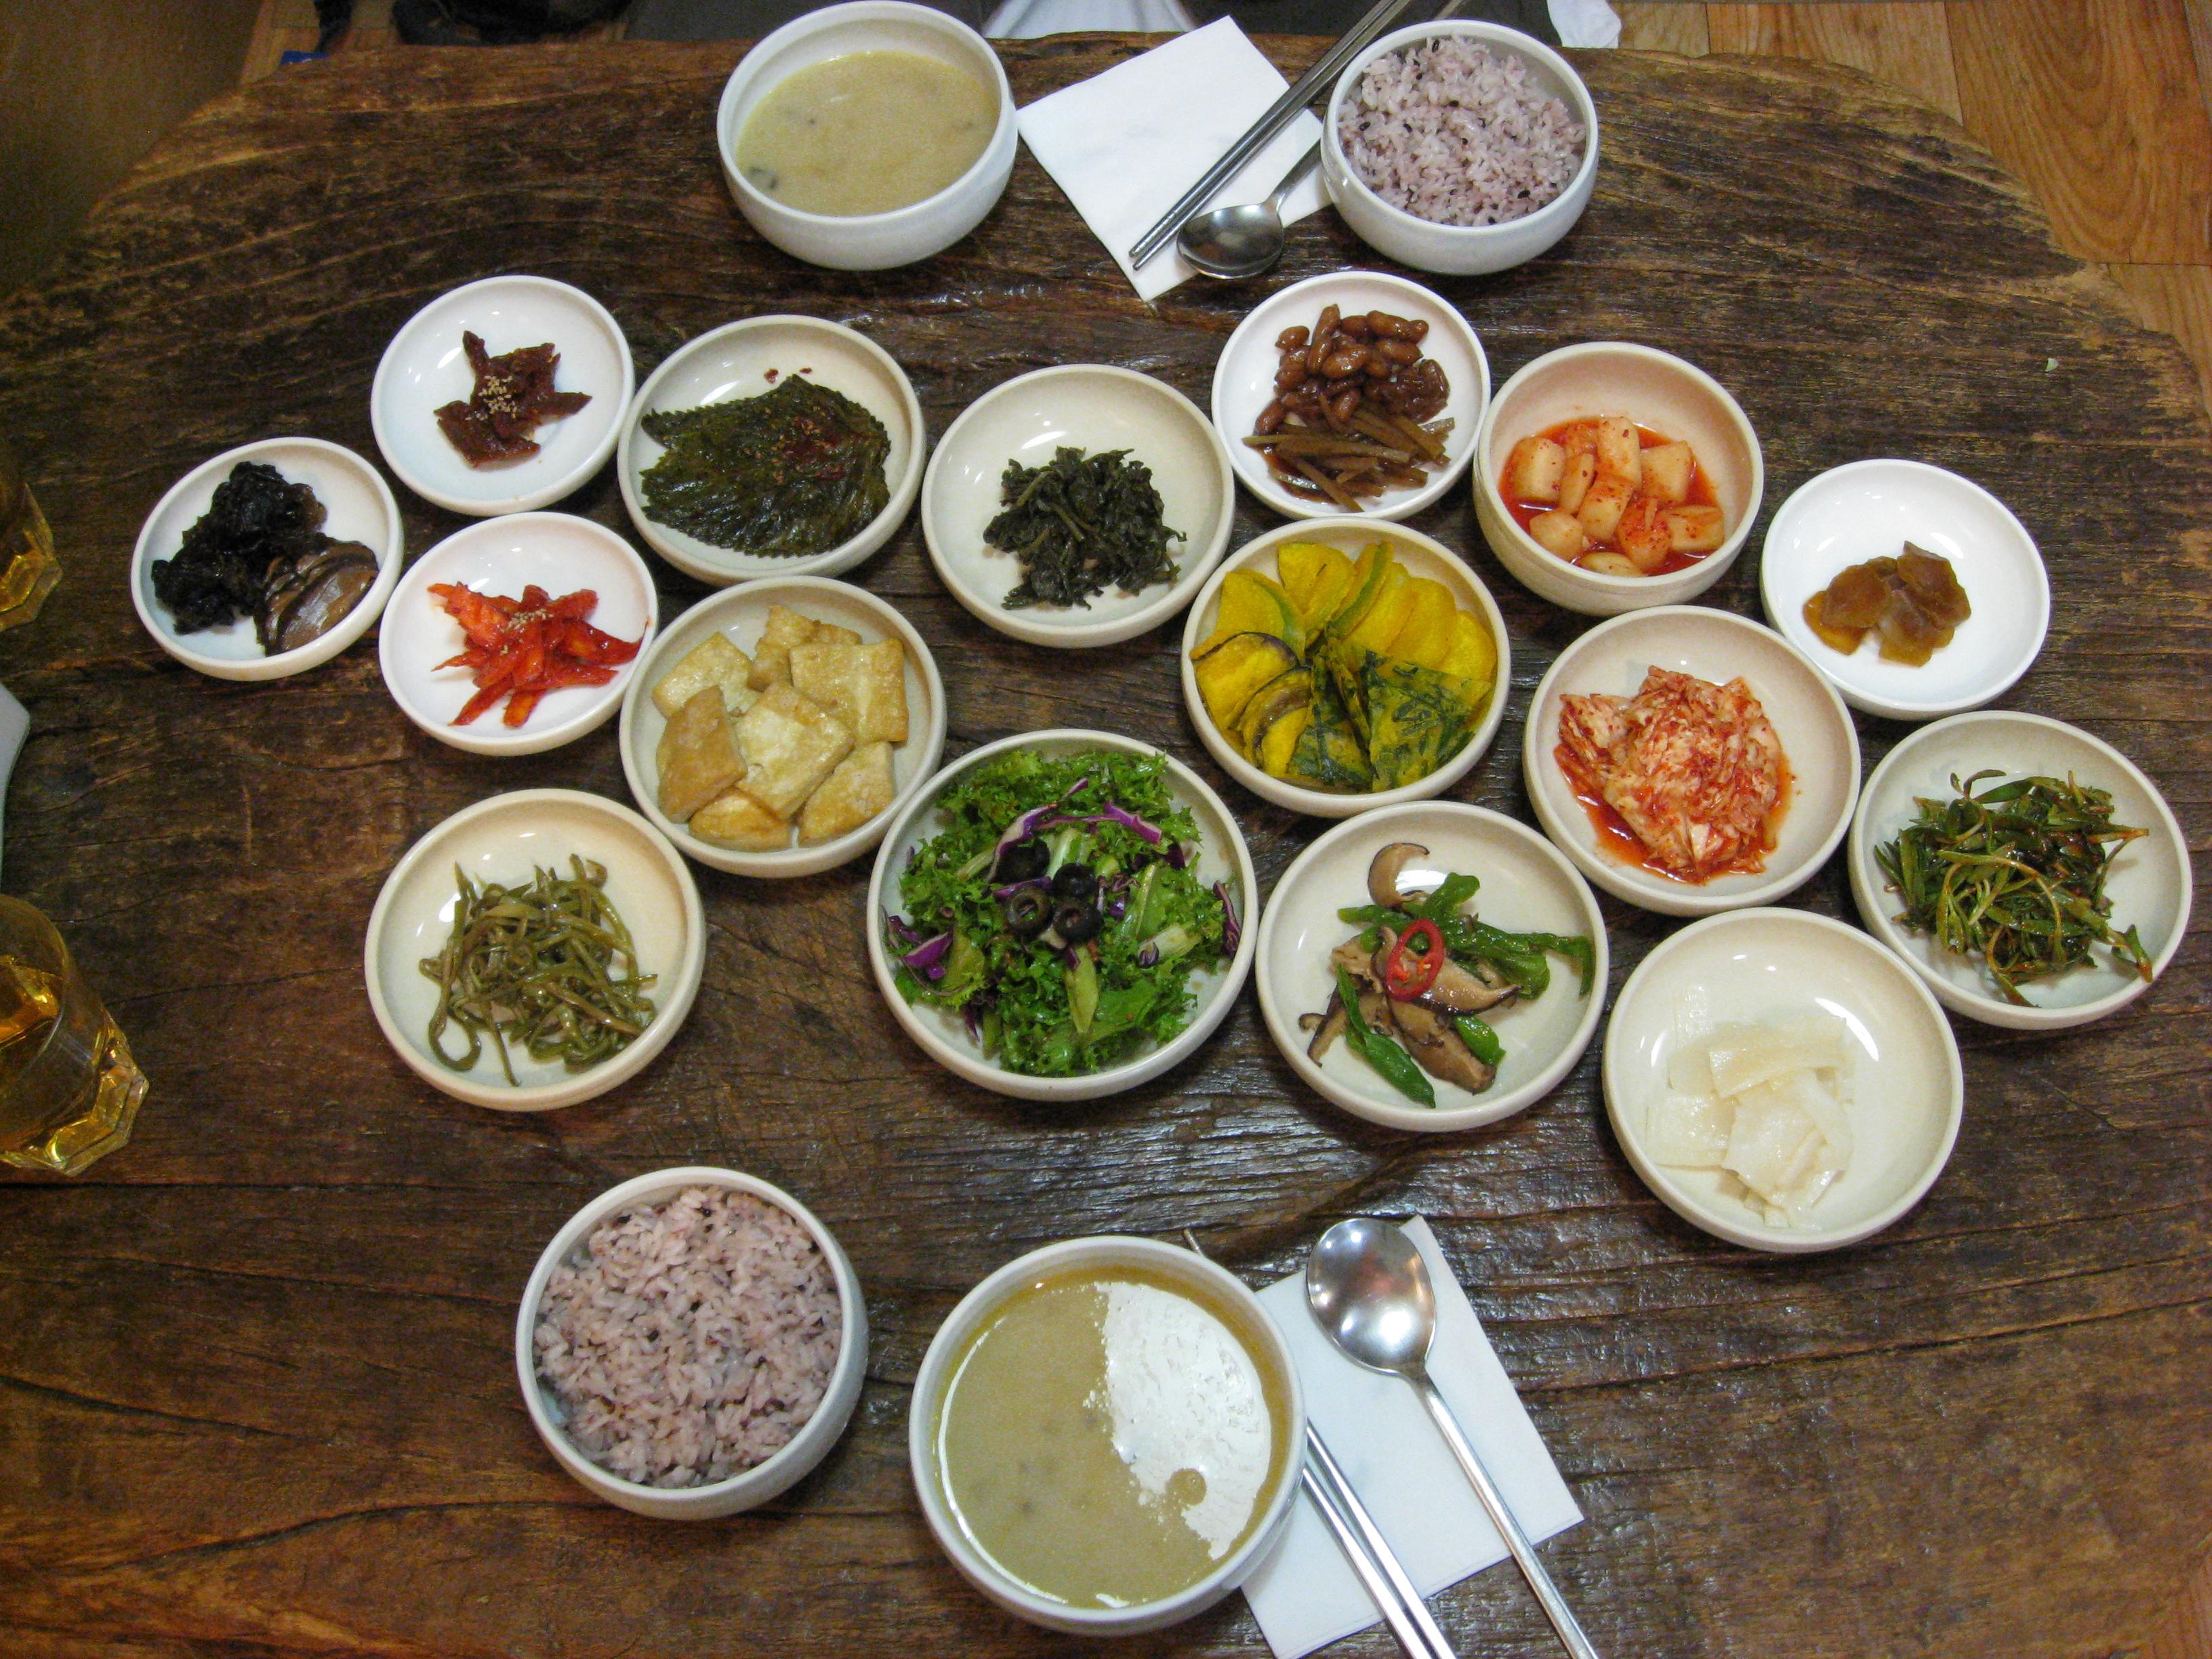 File saenggang cha korean tea jpg wikimedia commons - File Saenggang Cha Korean Tea Jpg Wikimedia Commons 22